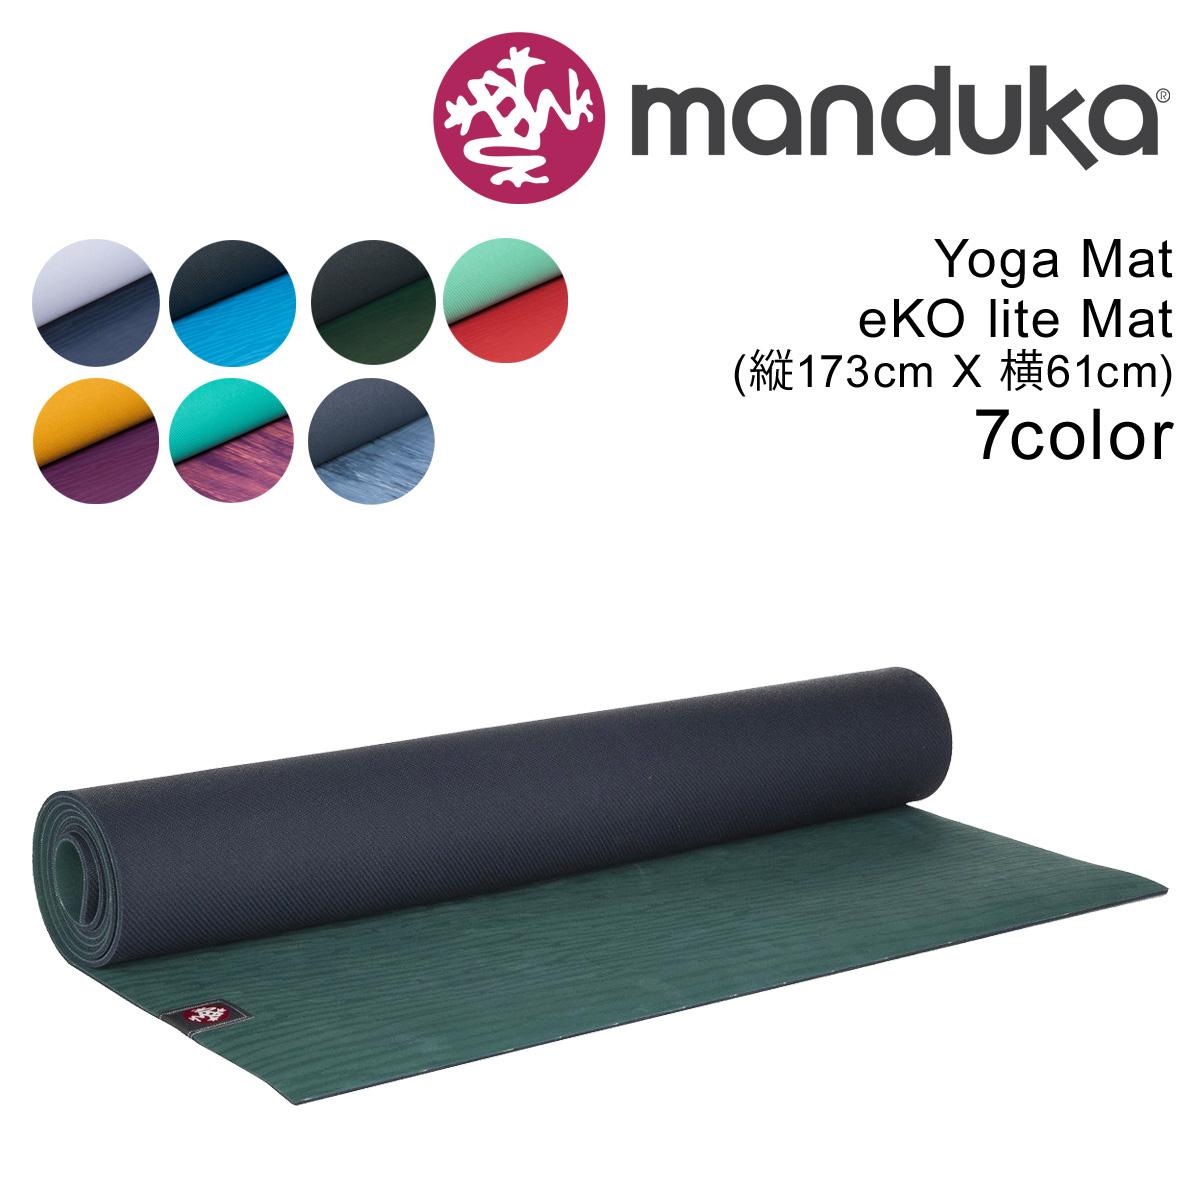 top-rated newest new styles purchase authentic マンドゥカ manduka yoga mat eKO Lite 173cm *61cm *4mm Ecolyte Bira Thijs  exercise Lady's men